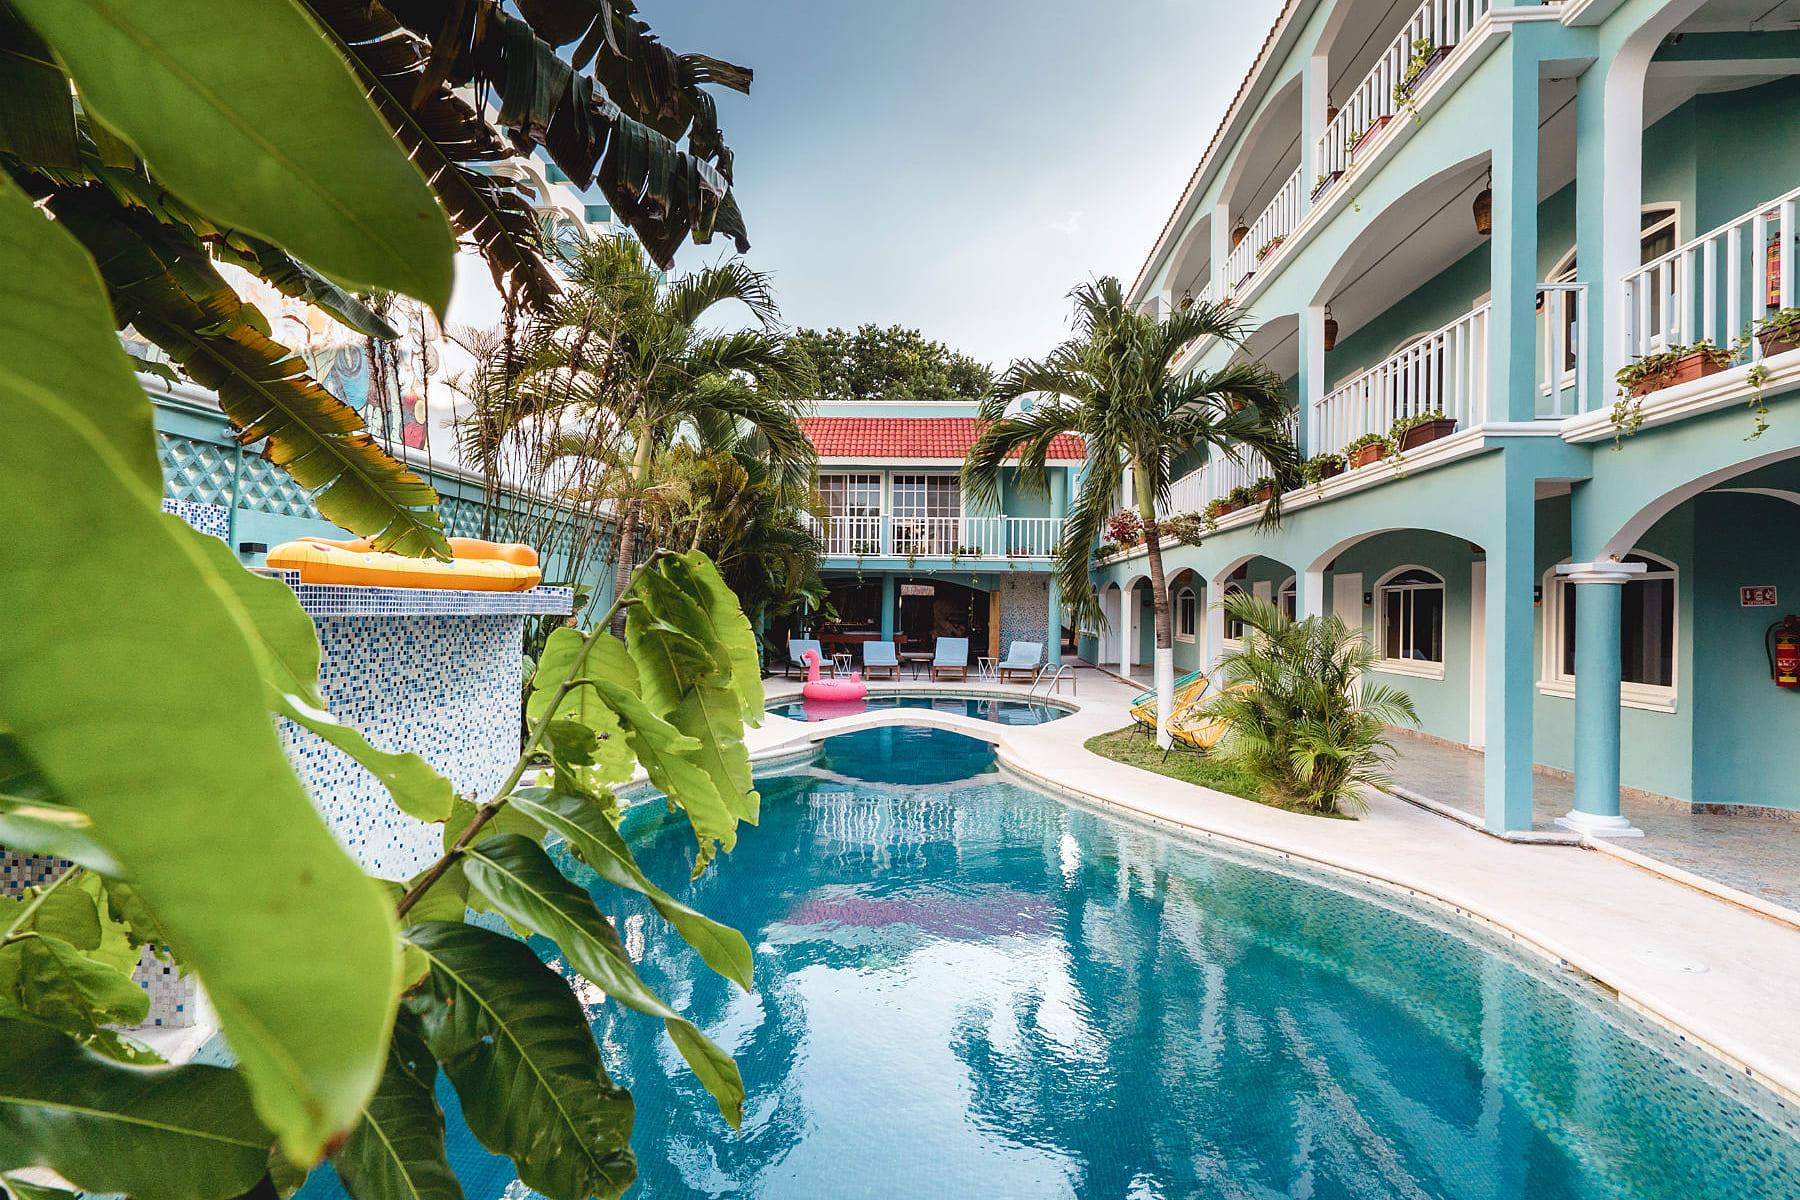 Stay and Explore Playa del Carmen Mexico | Selina